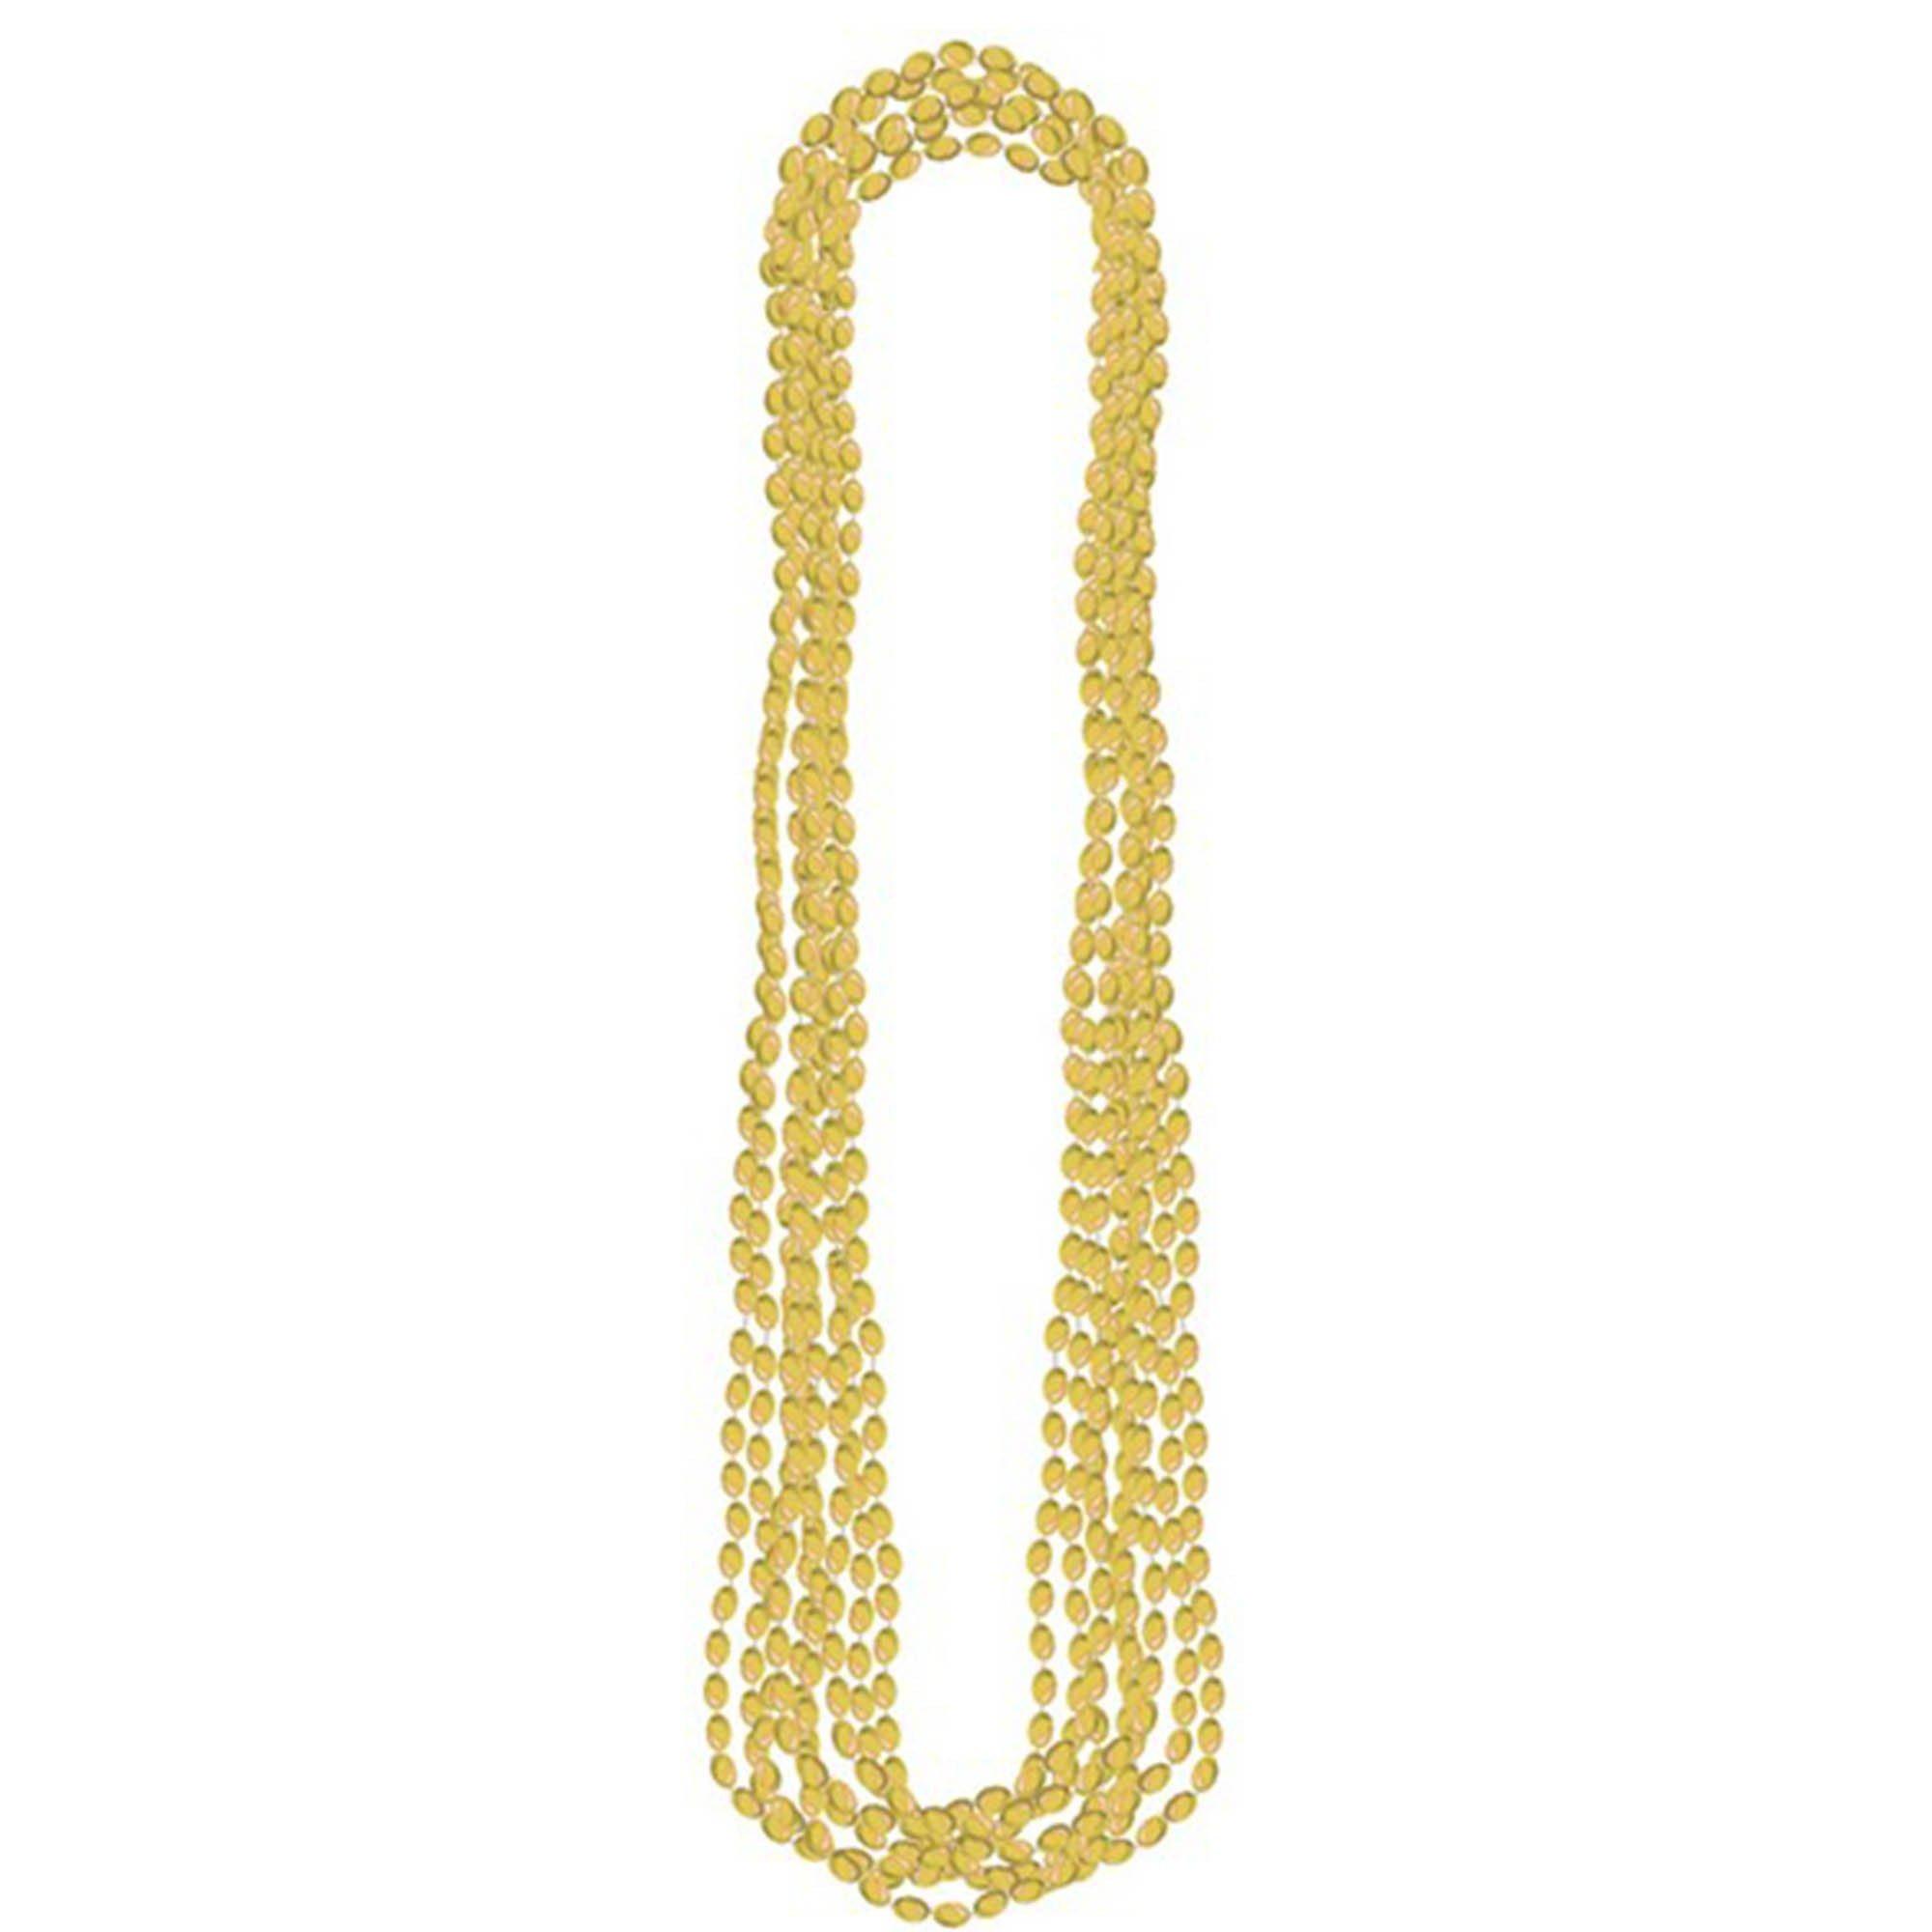 Metallic Necklace - Gold